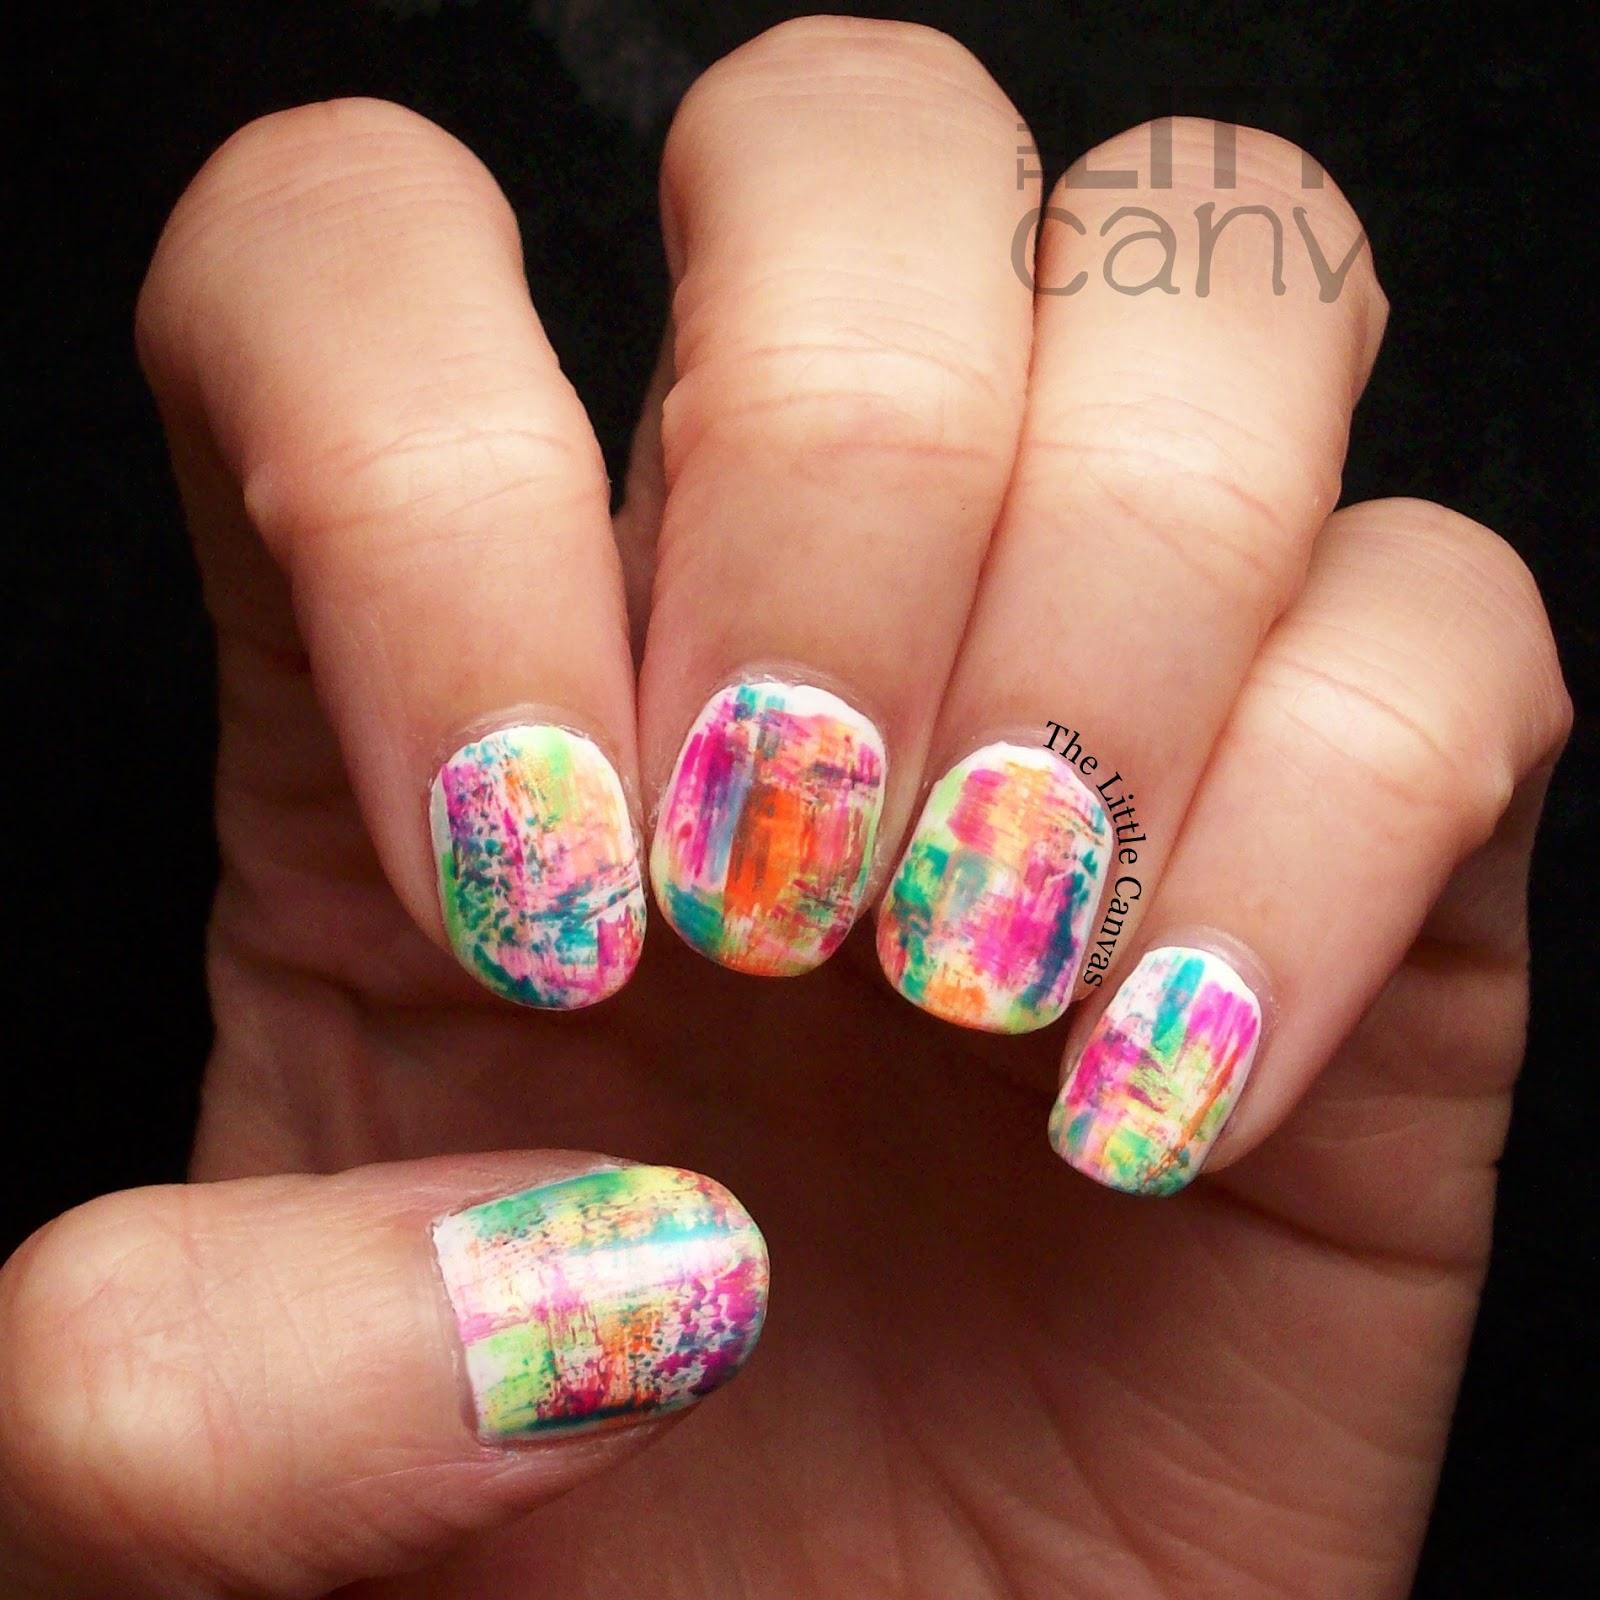 Salon Perfect Neon Pop Grunge Nails The Little Canvas